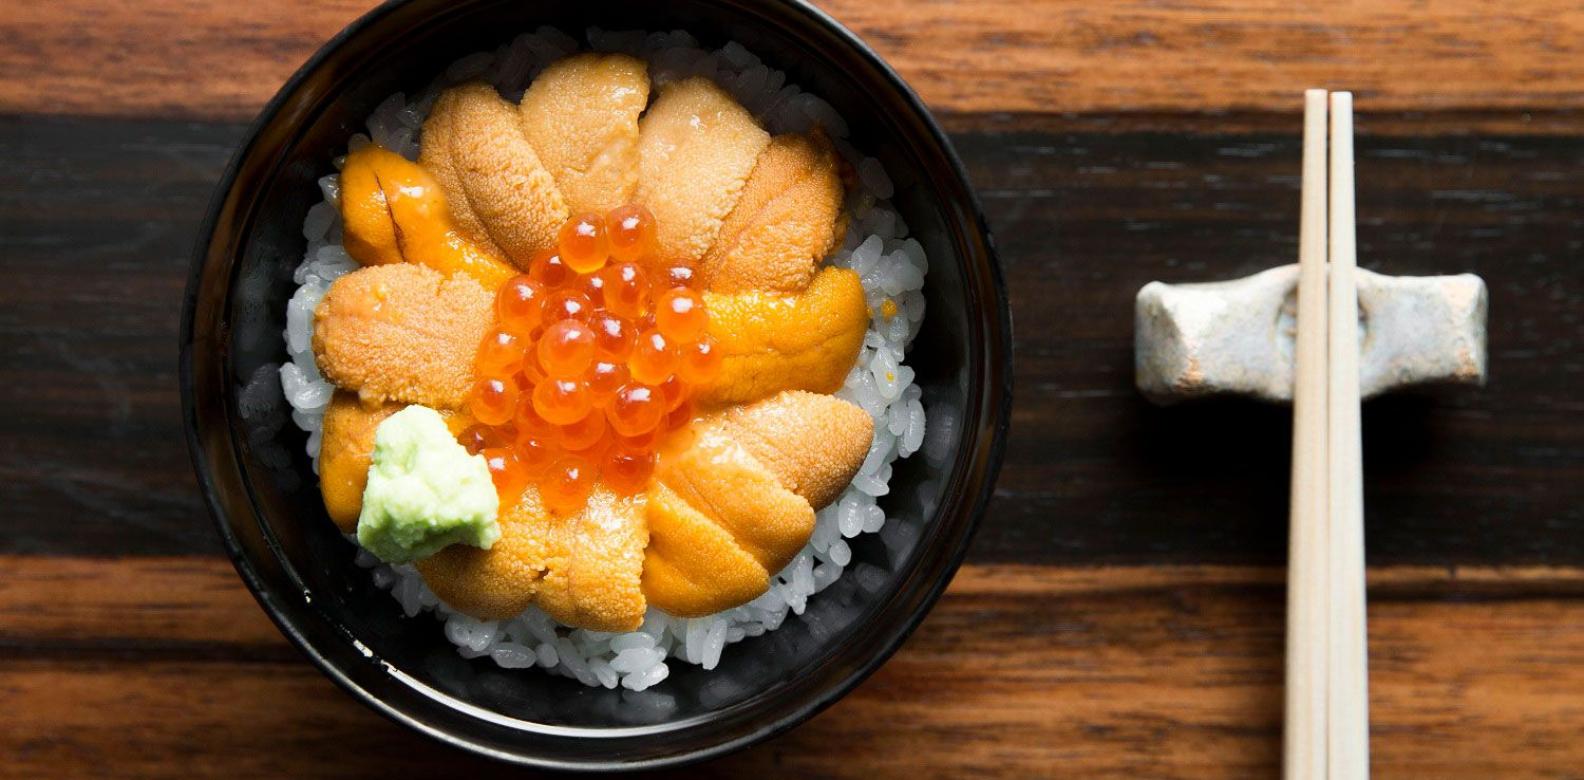 Sea urchin and salmon roe set on rice (Photo: Courtesy of Marina Bay Sands)